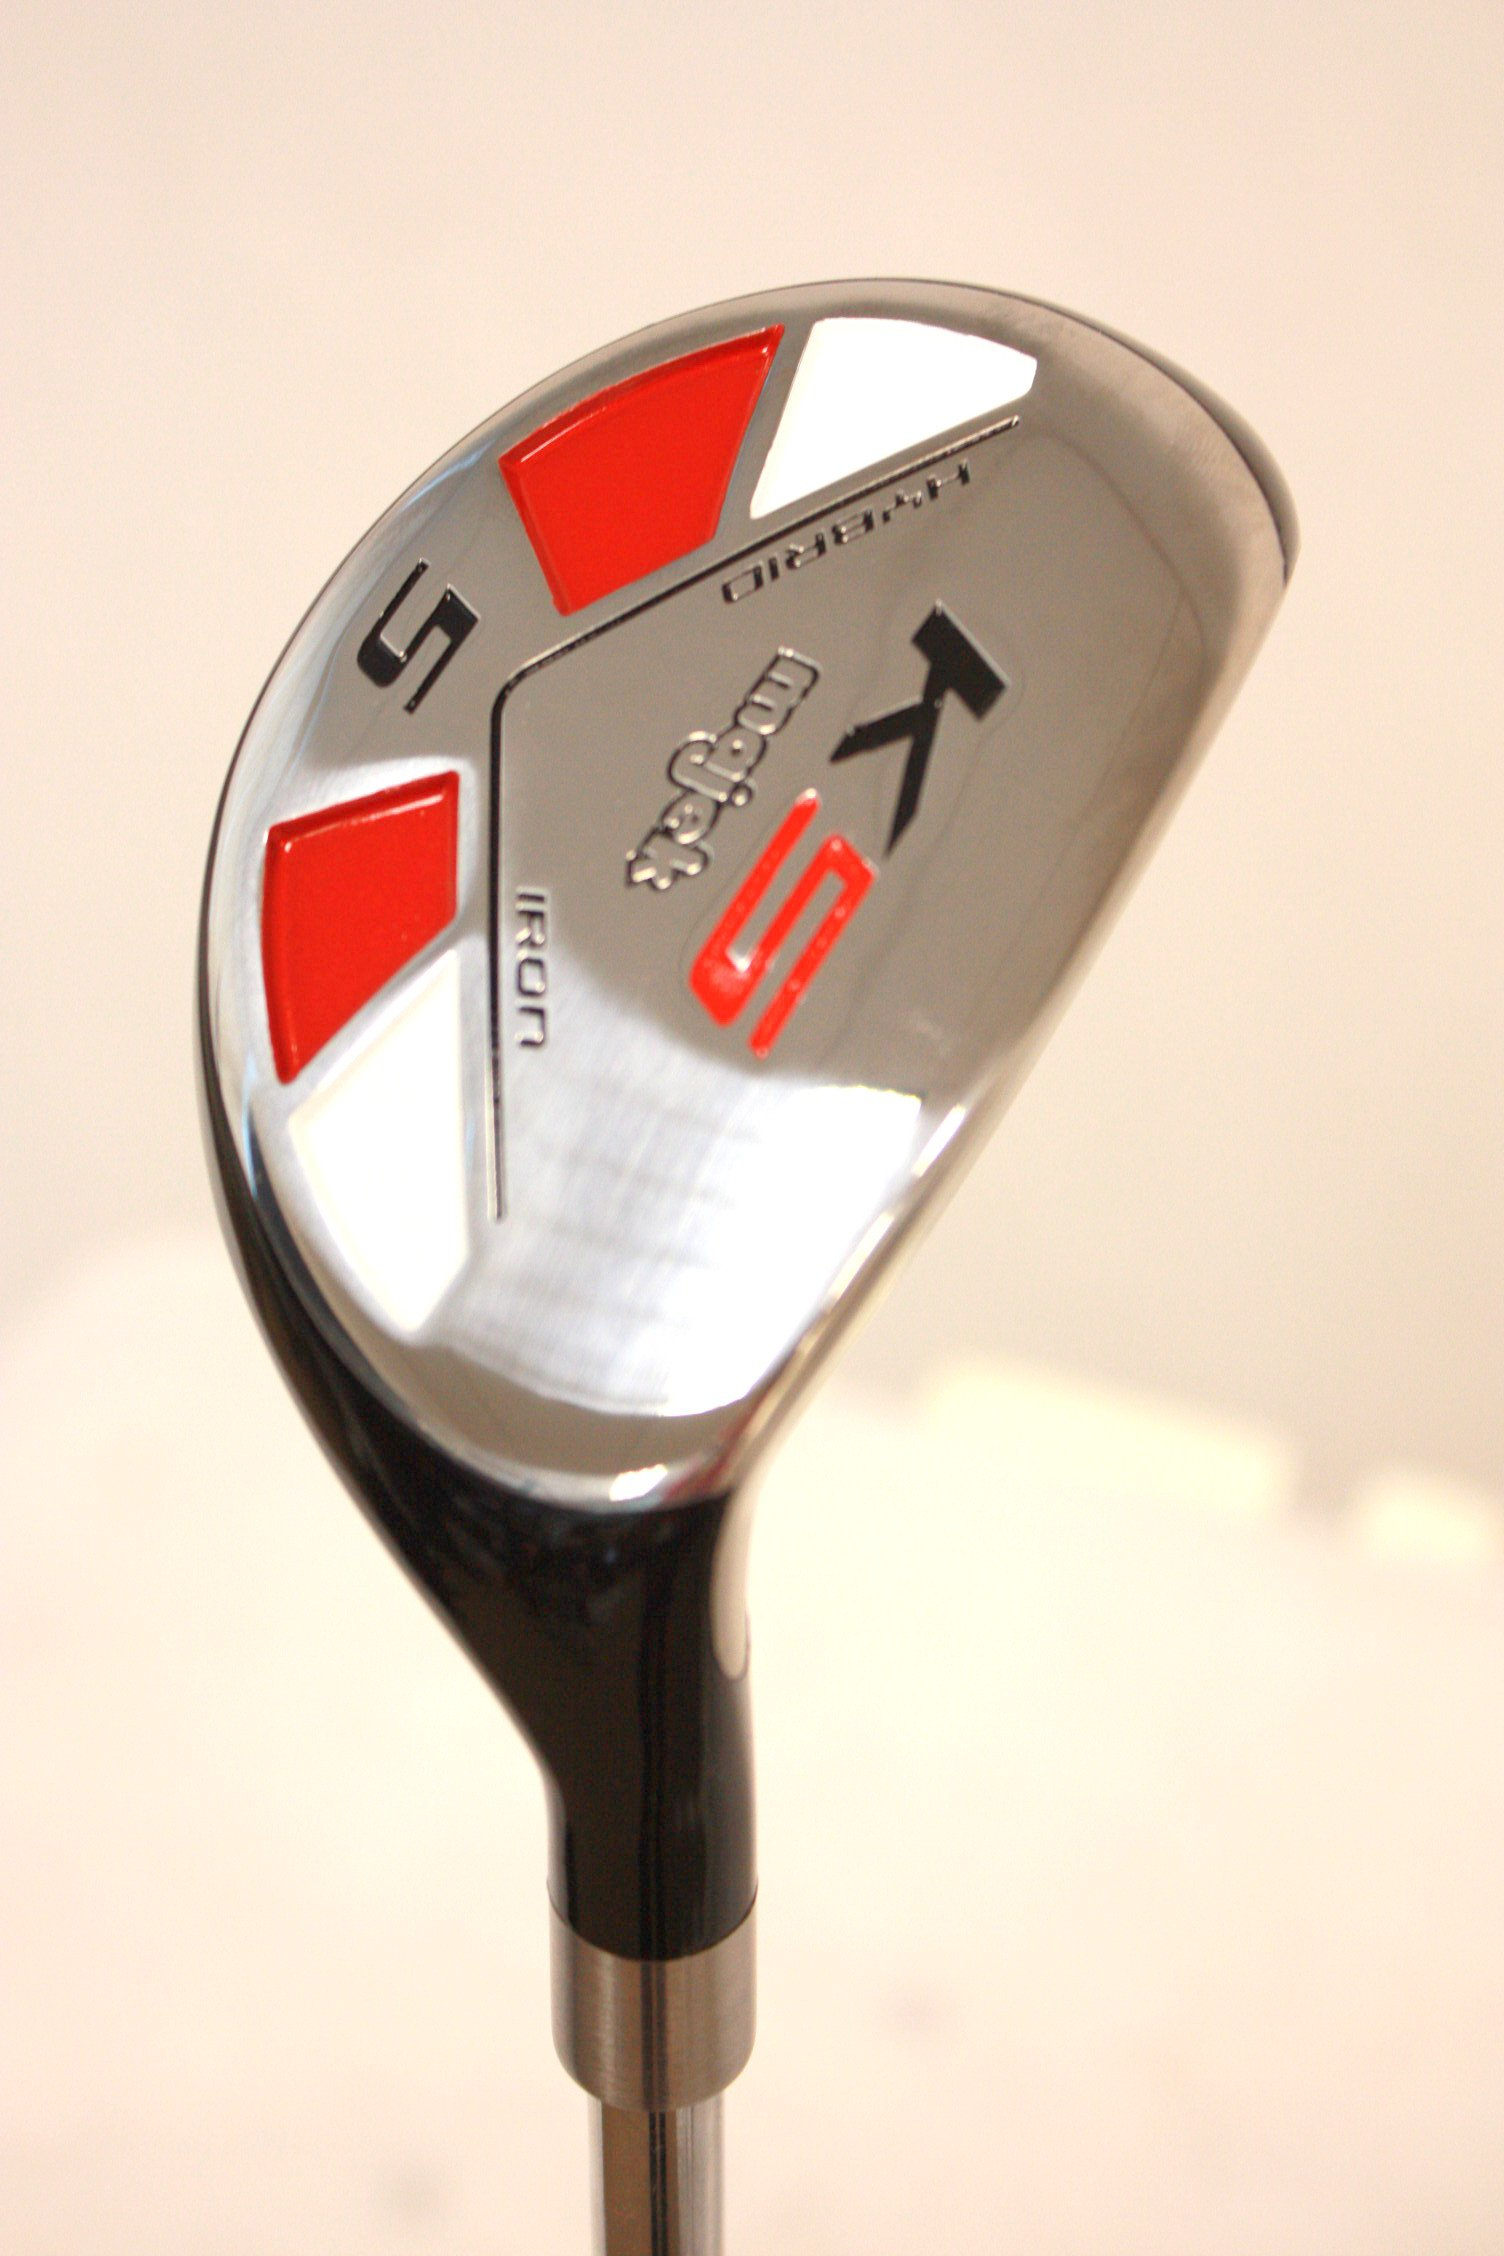 Majek Golf All Hybrid #5: +2 Inches Longer Than Men's Standard Length, Extra Big & Tall XL, Extra Long XXL, Stiff Flex Right Handed New Rescue Utility S Flex Club